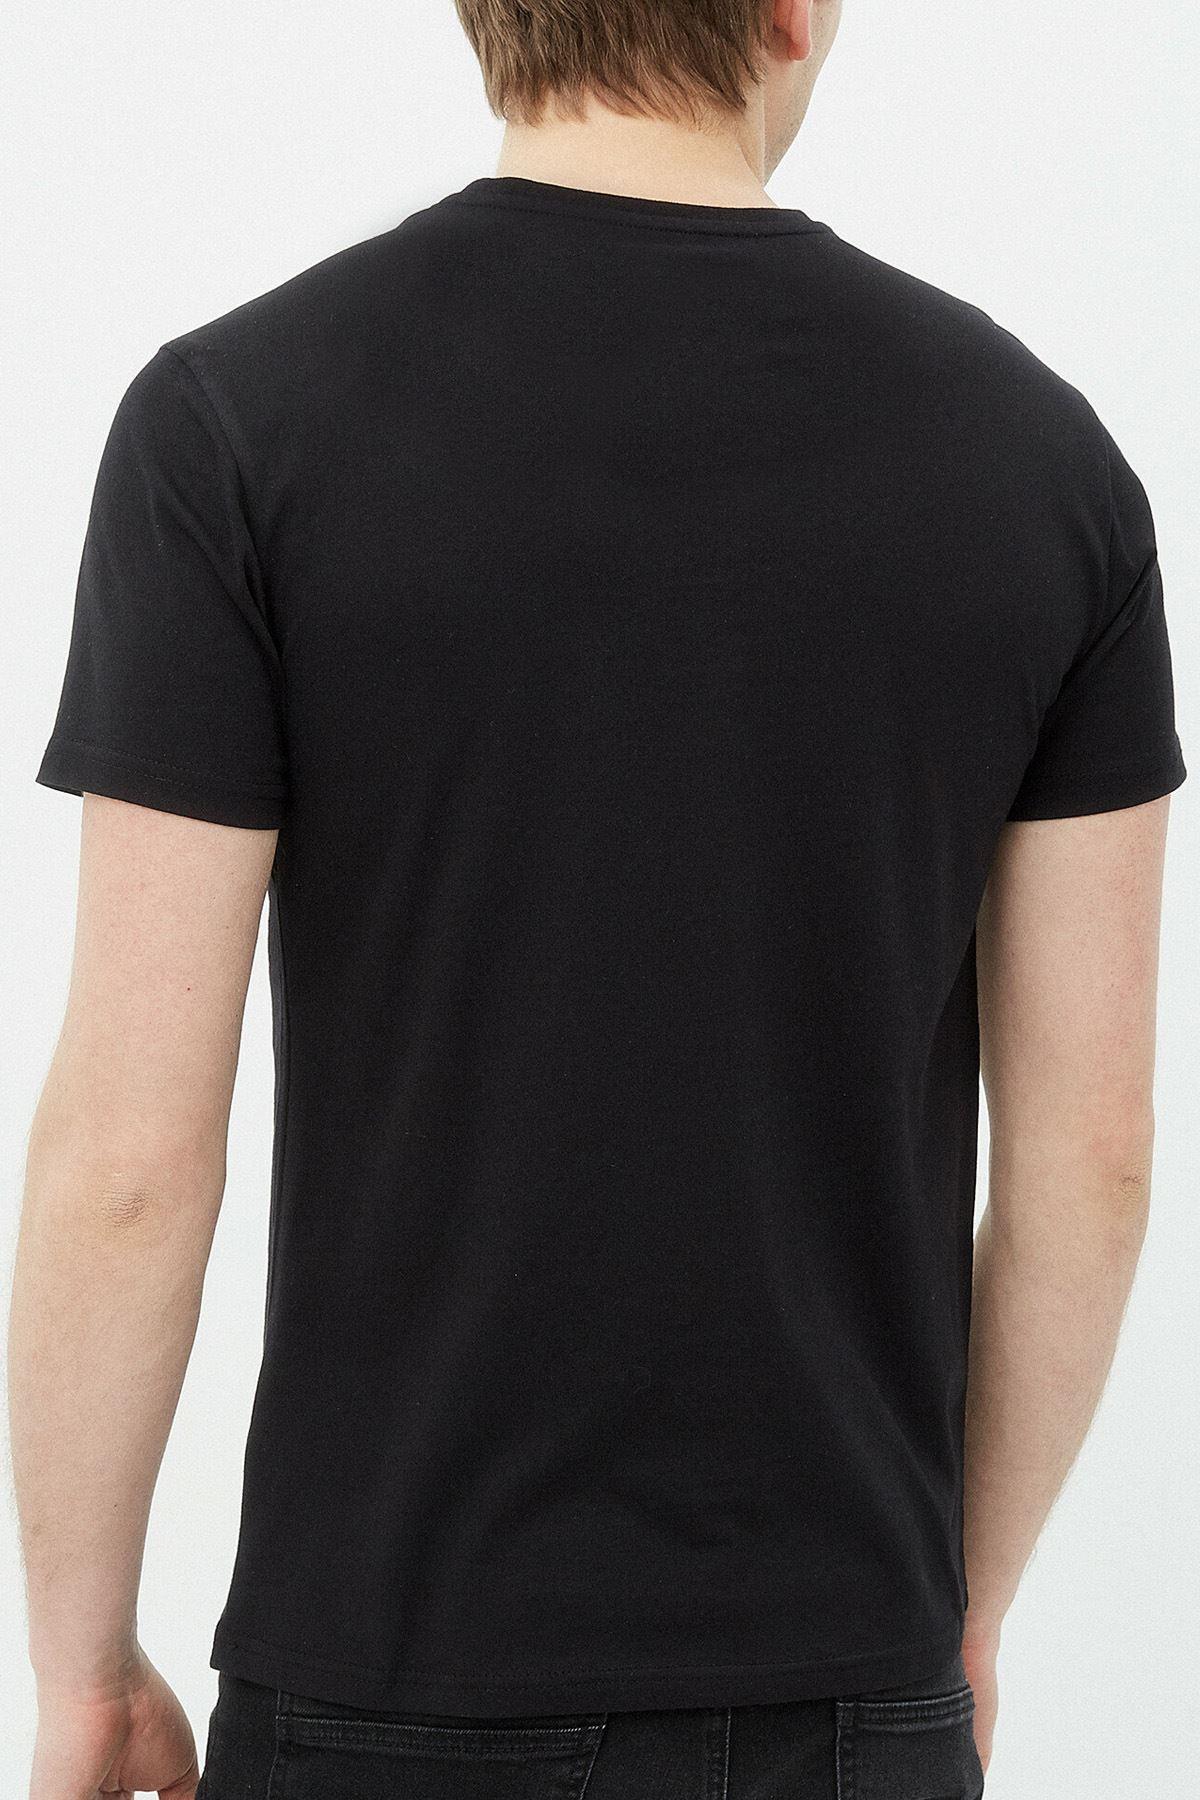 Anime Monkey 02 Siyah Erkek Tshirt - Tişört